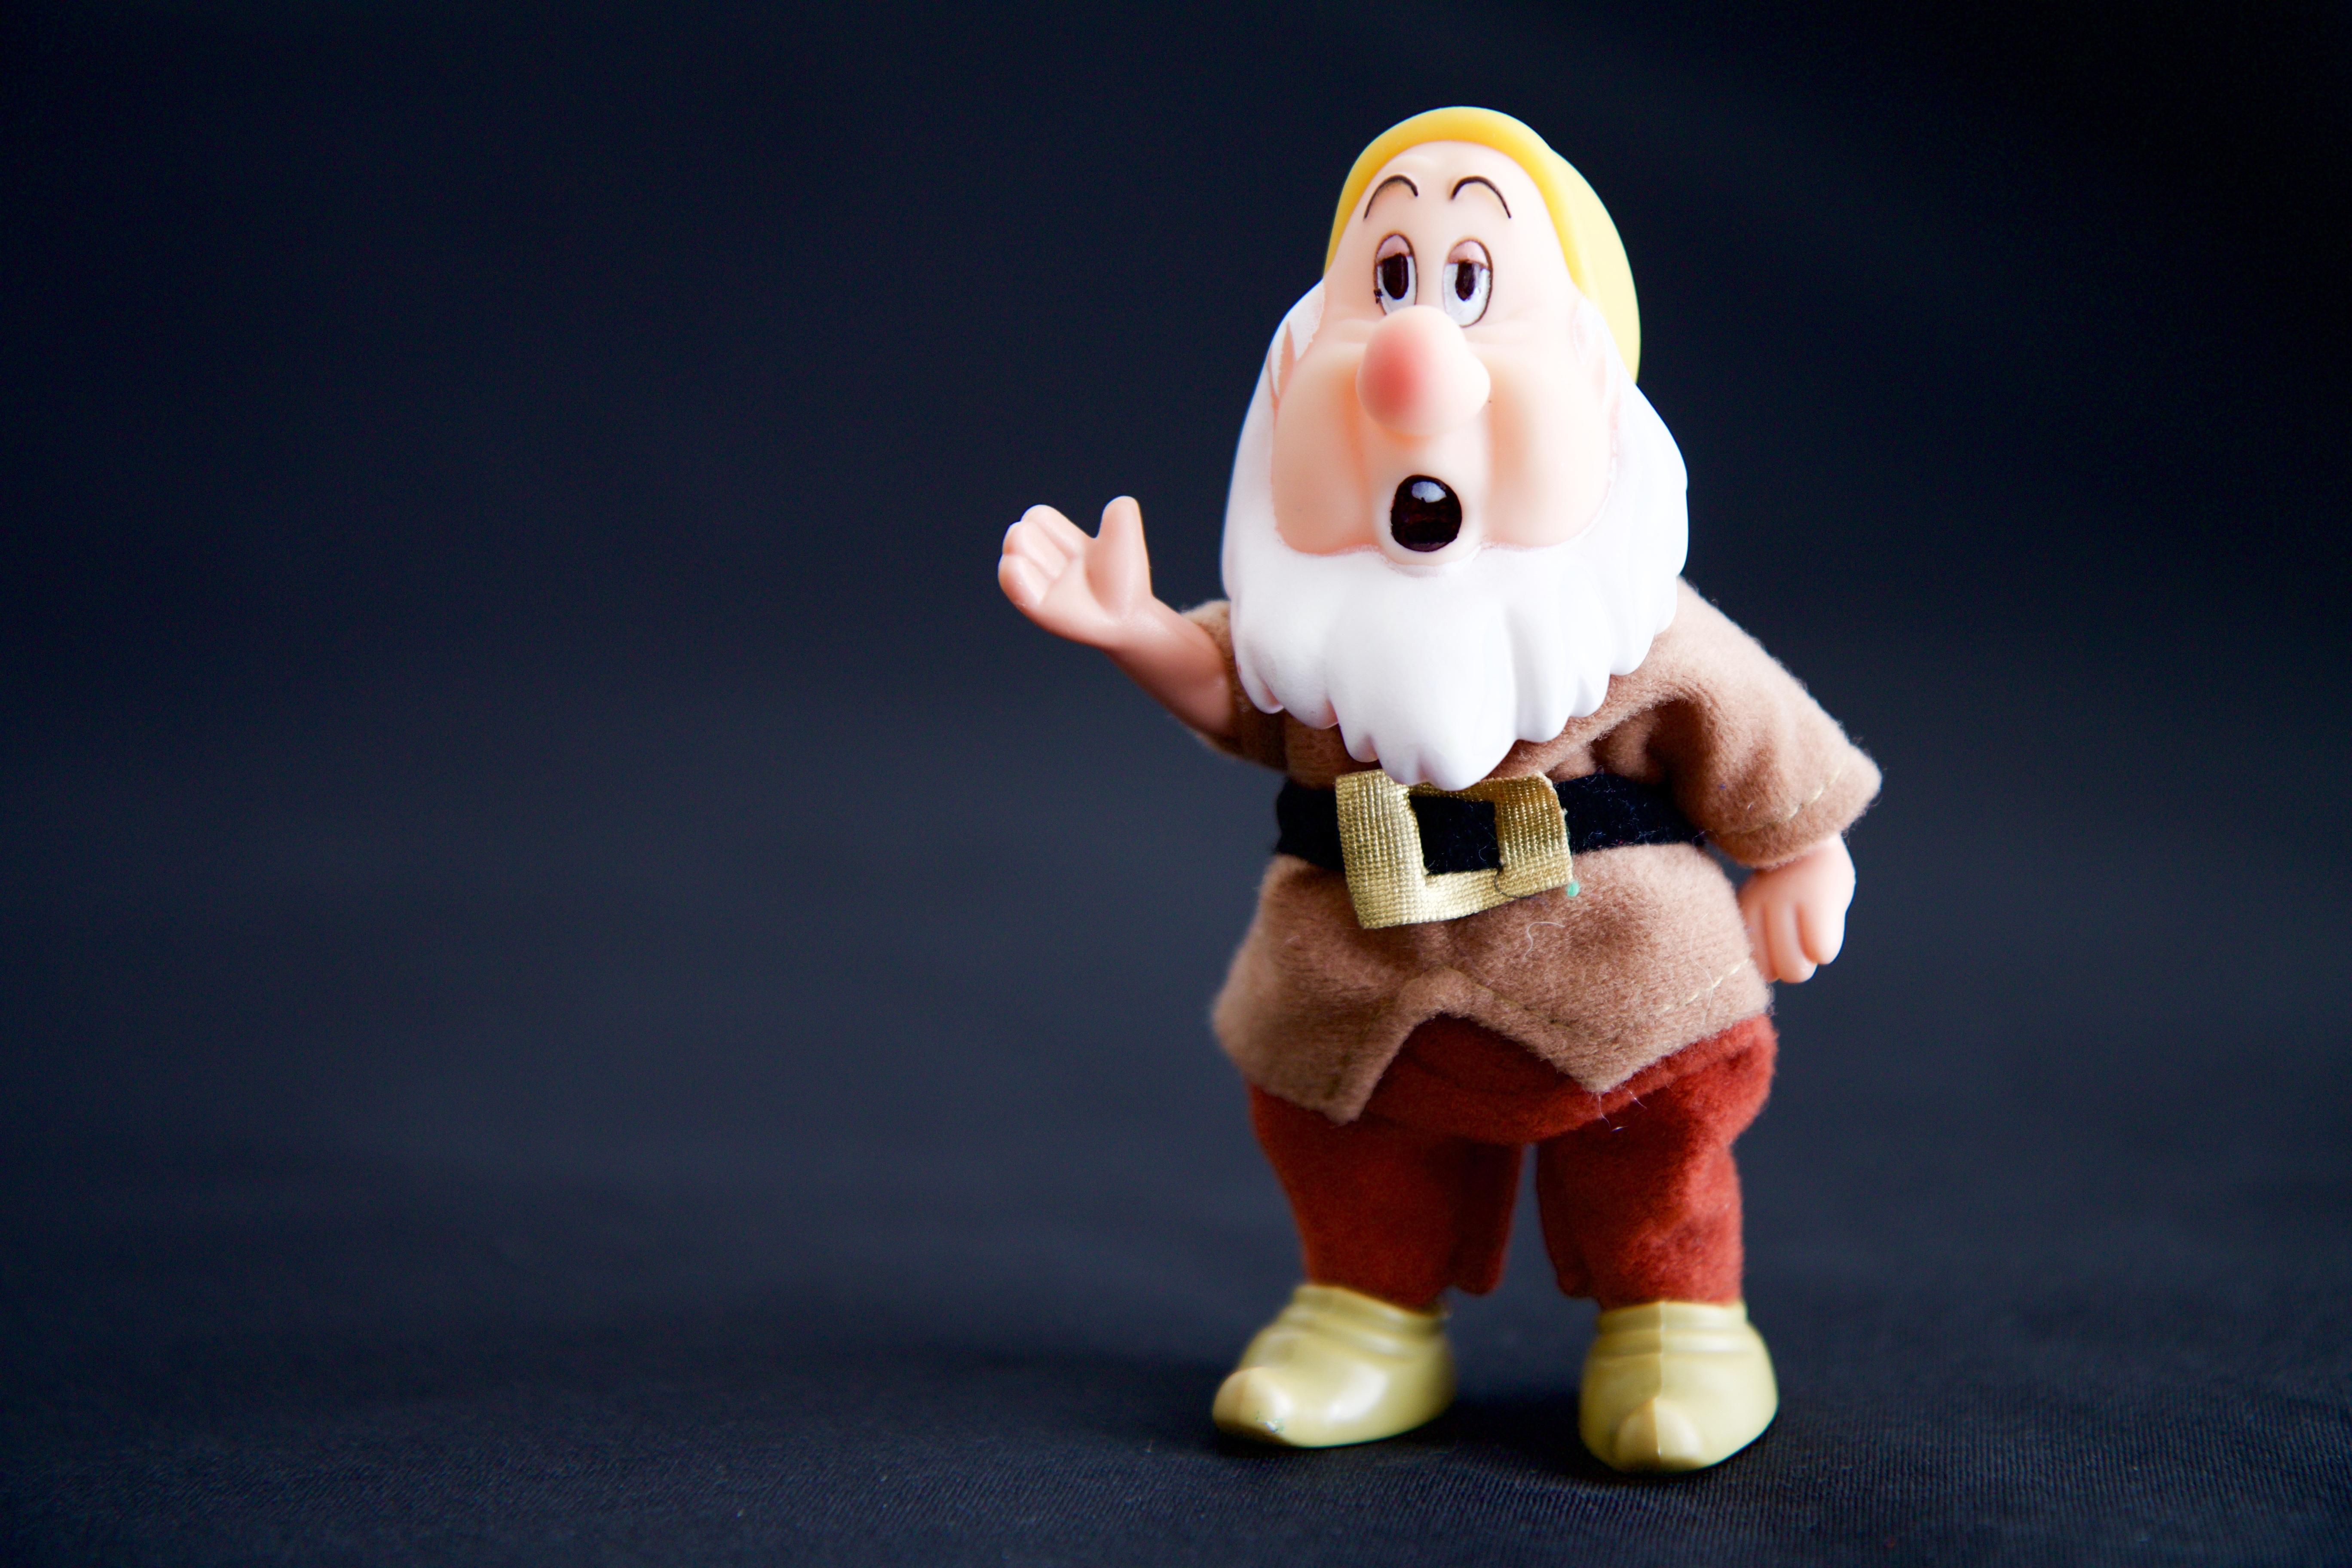 Free Images : gesture, toy, figure, figurine, costume, smurf